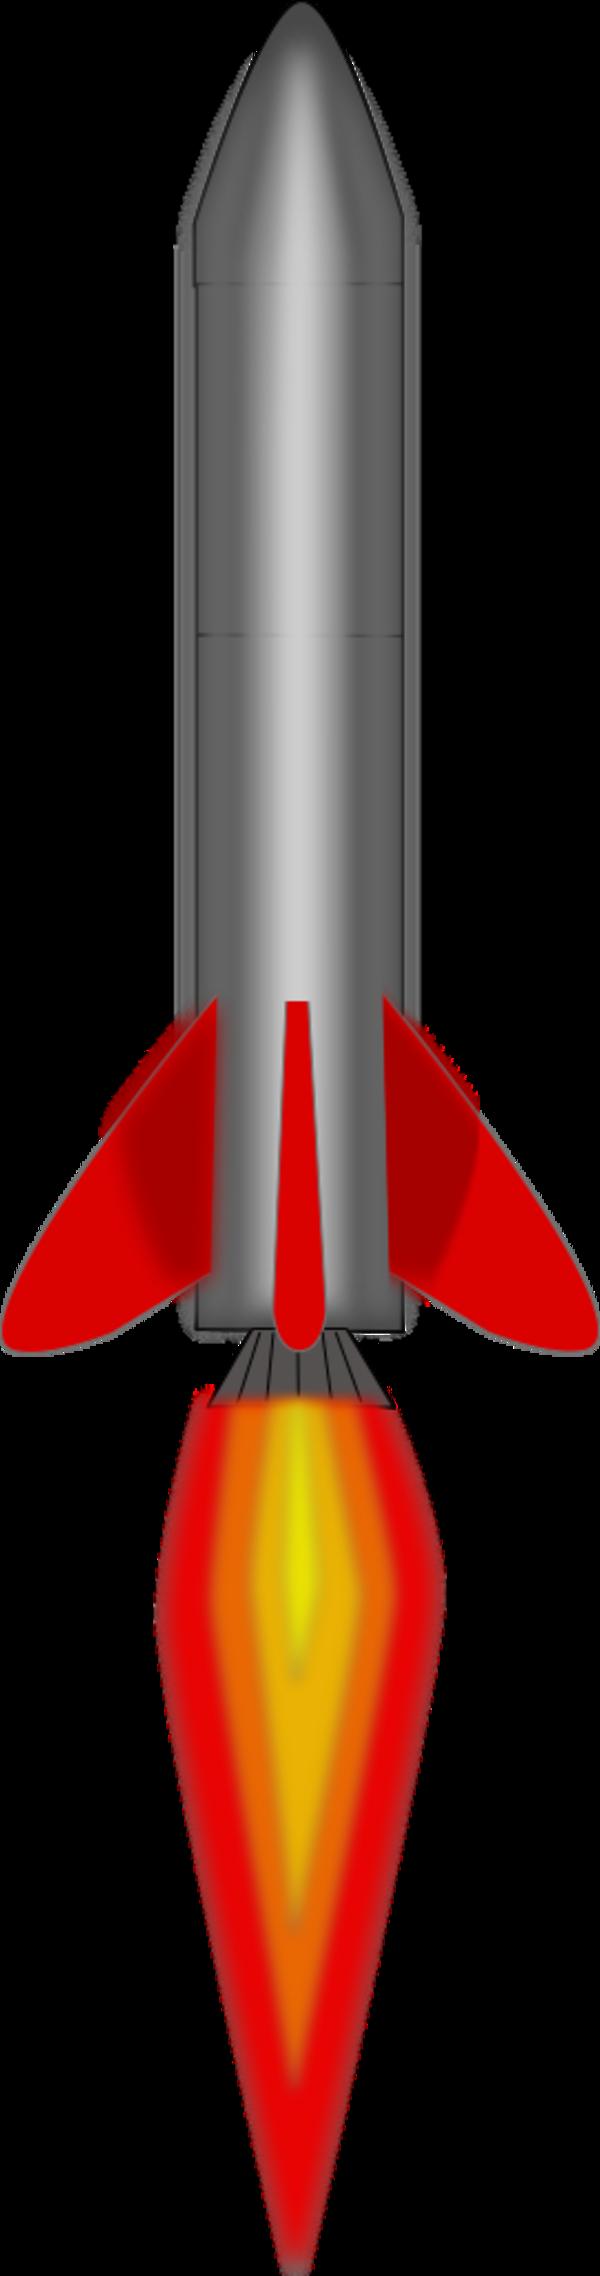 Nuclear missile clip art. Clipart rocket rocket fire